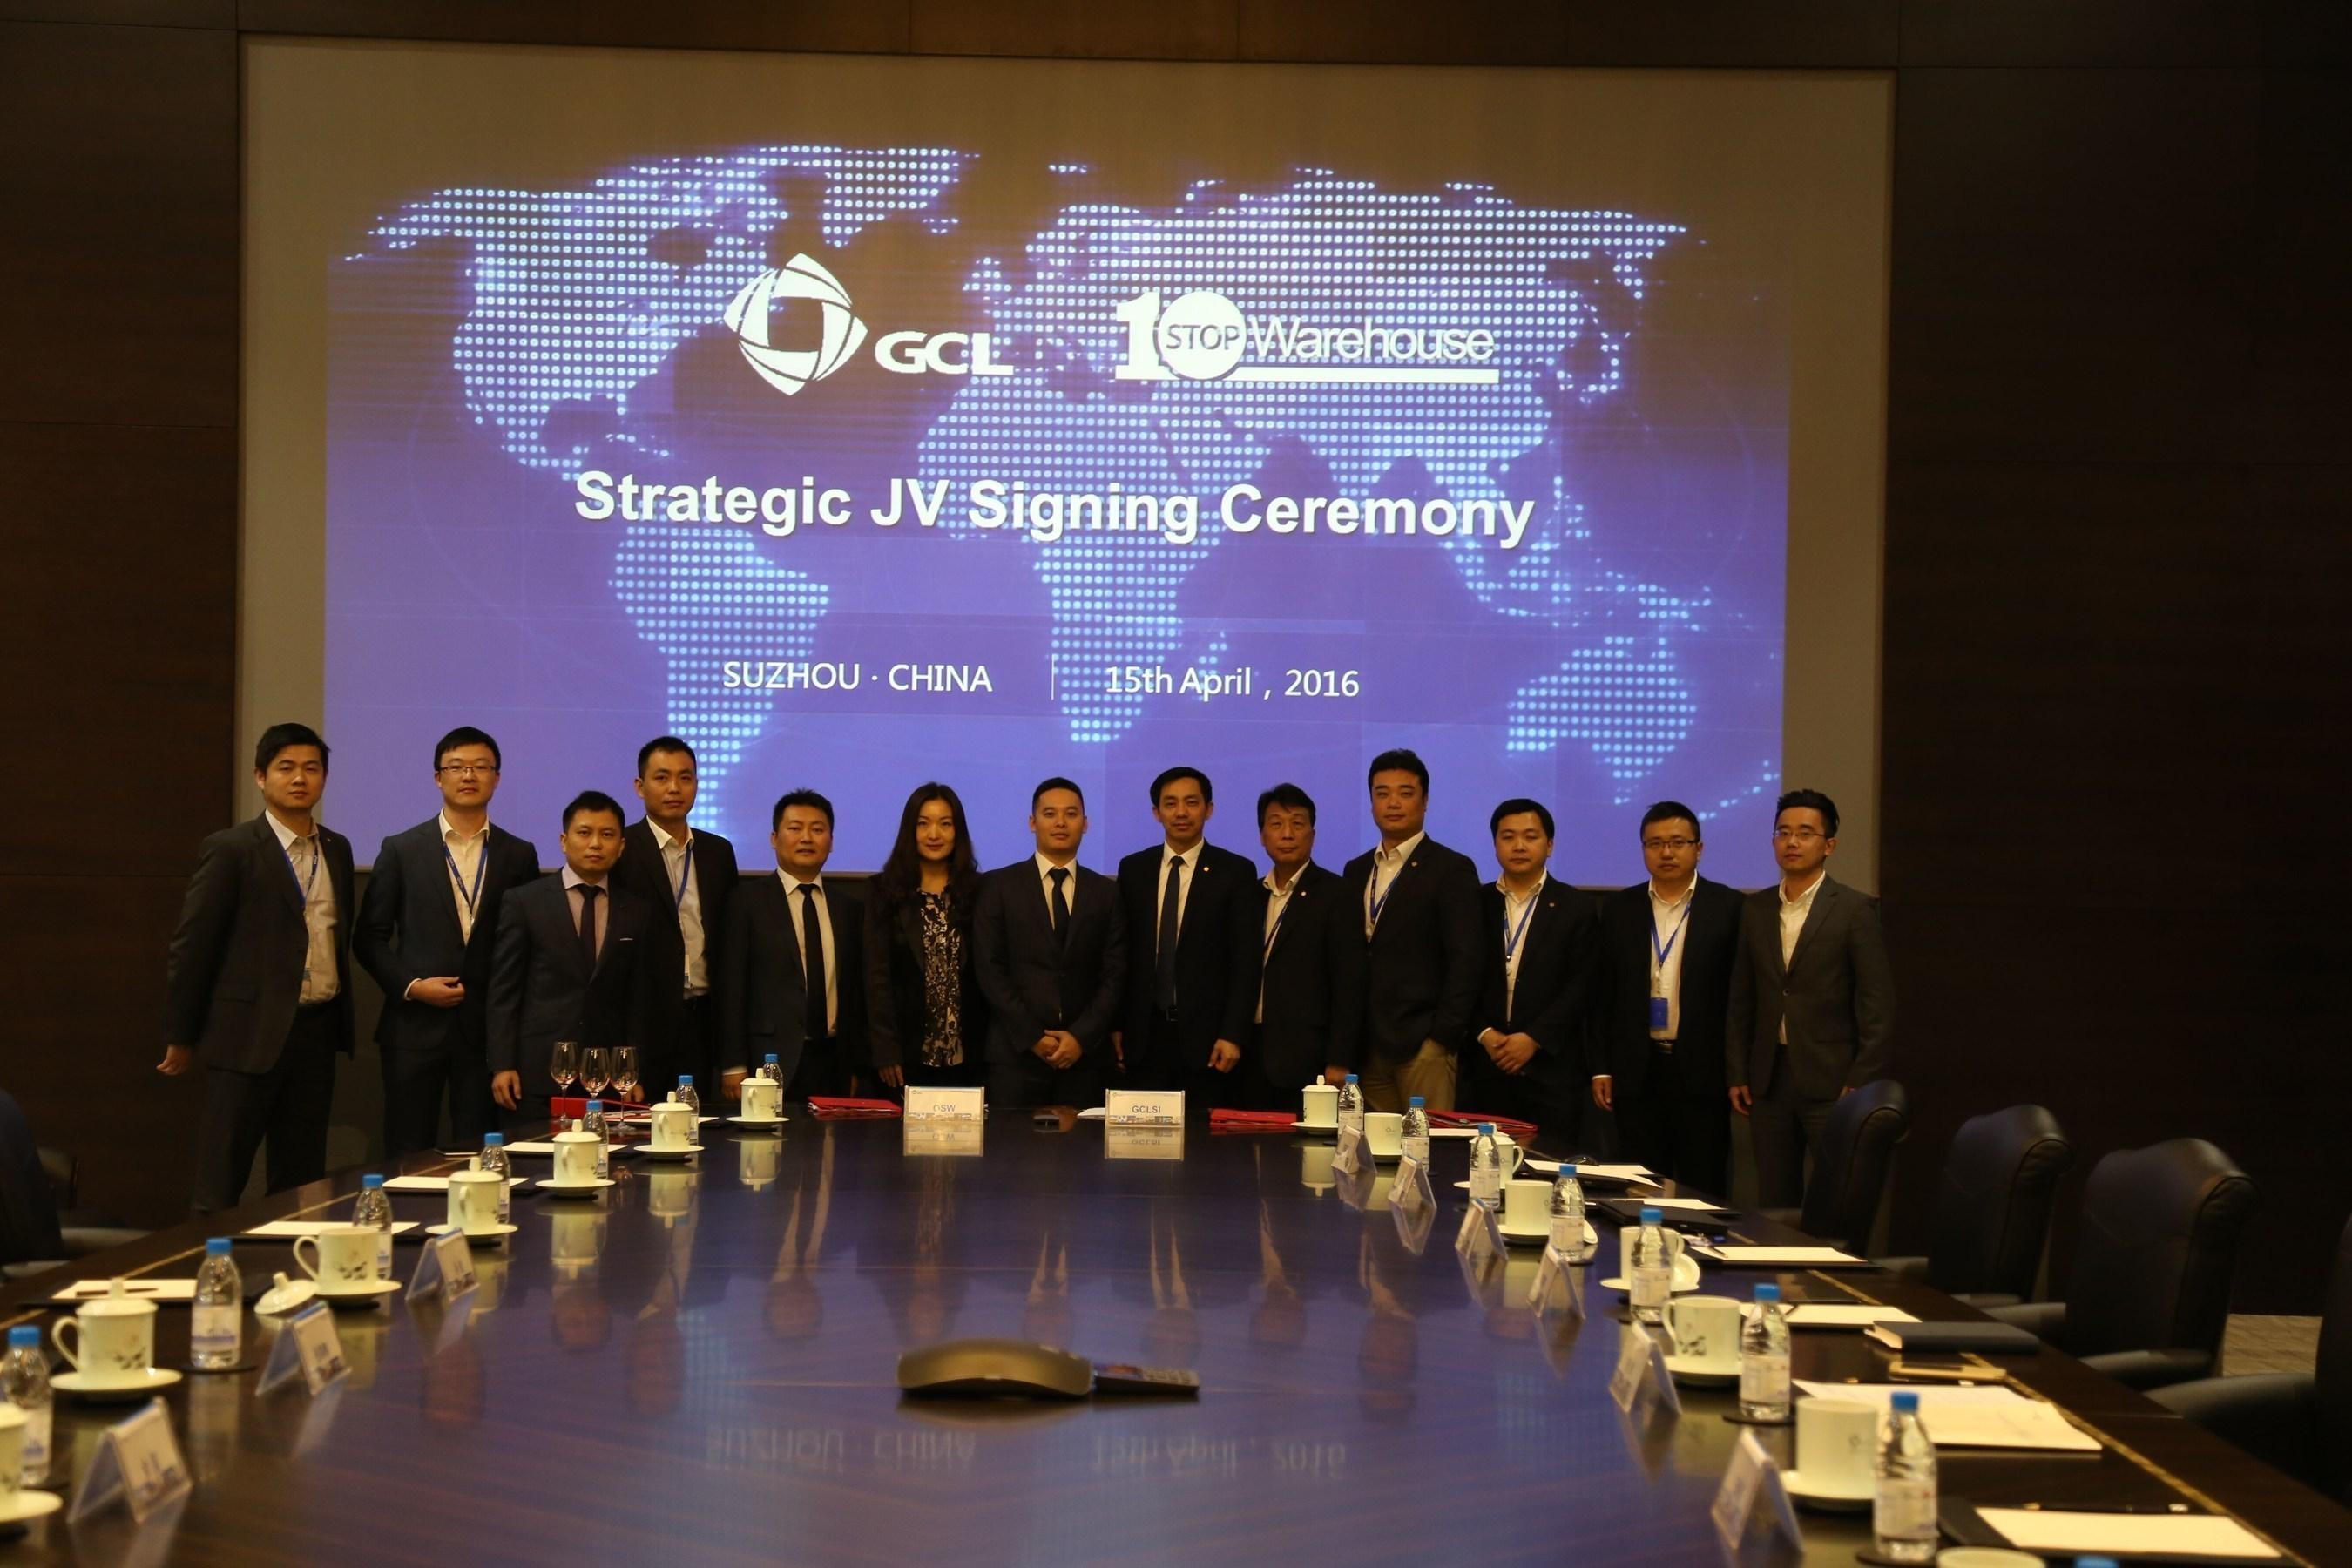 GCL-SI Strategically Acquires Australia OSW